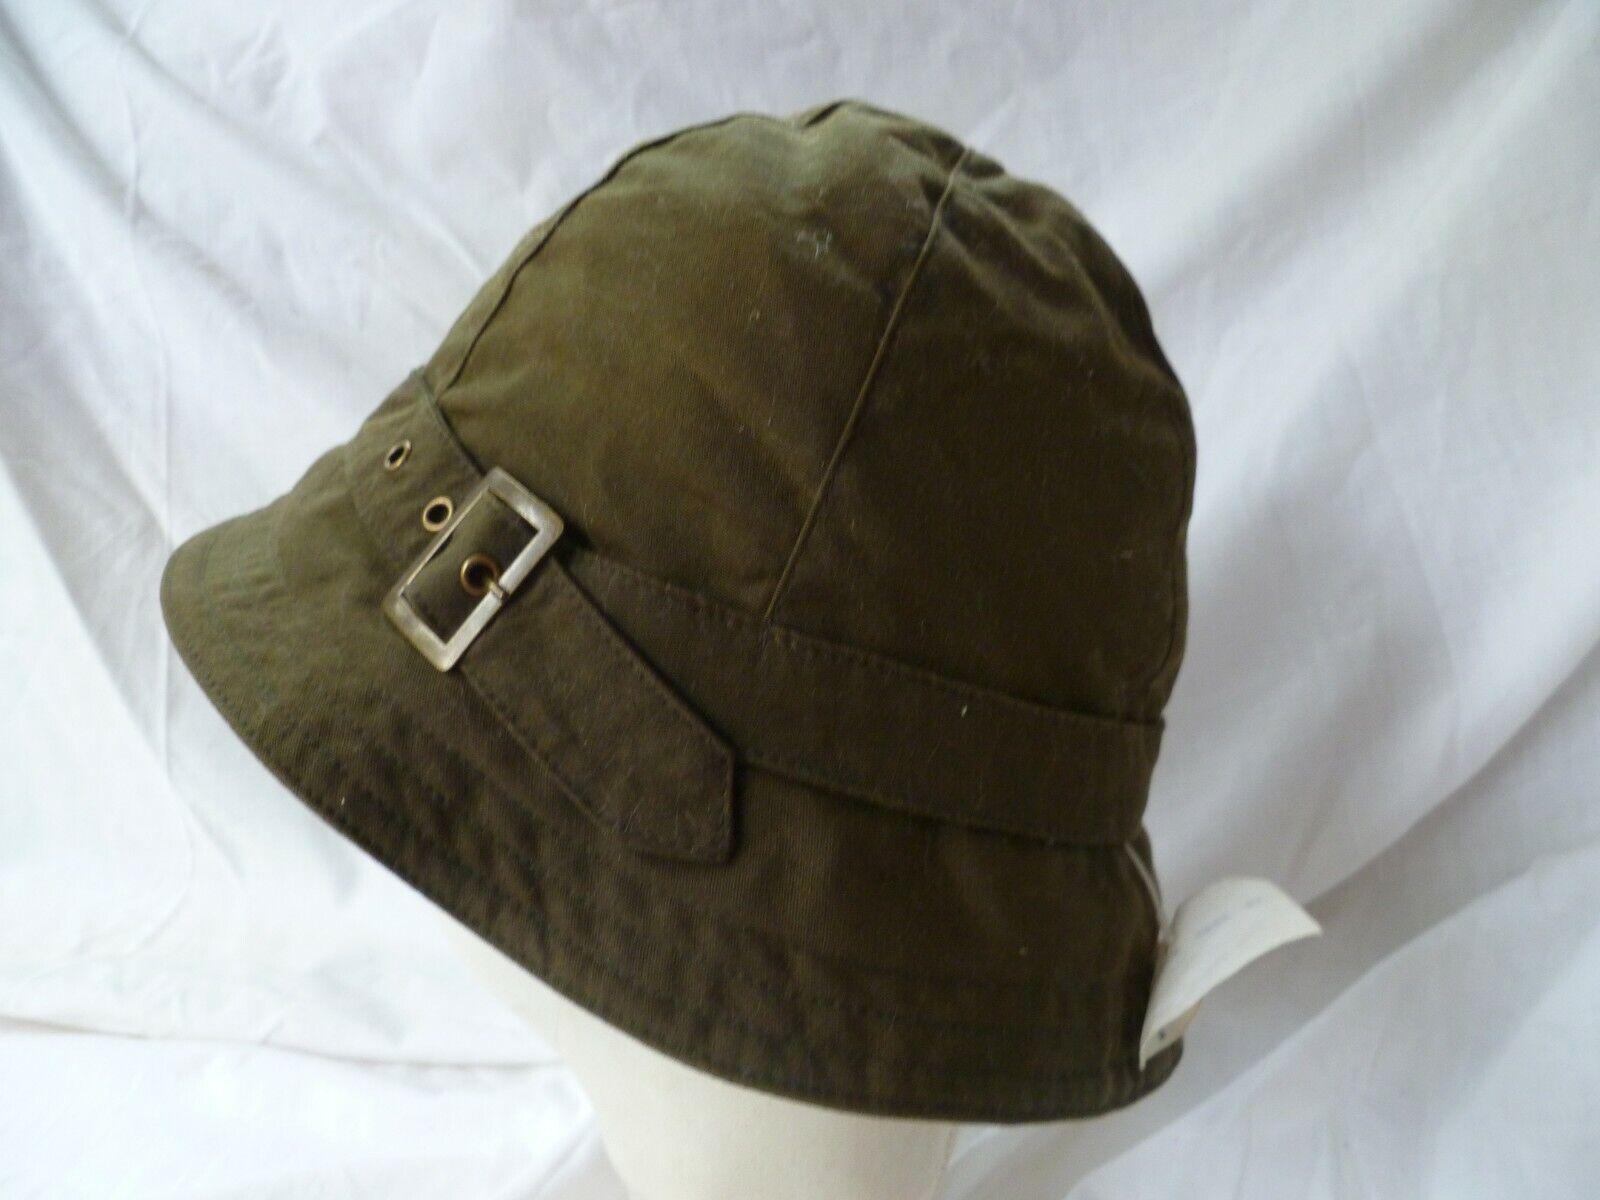 'Failsworth' Showerproof Khaki Green Cotton Rain Hat Belt Buckle Band 58cms NEW